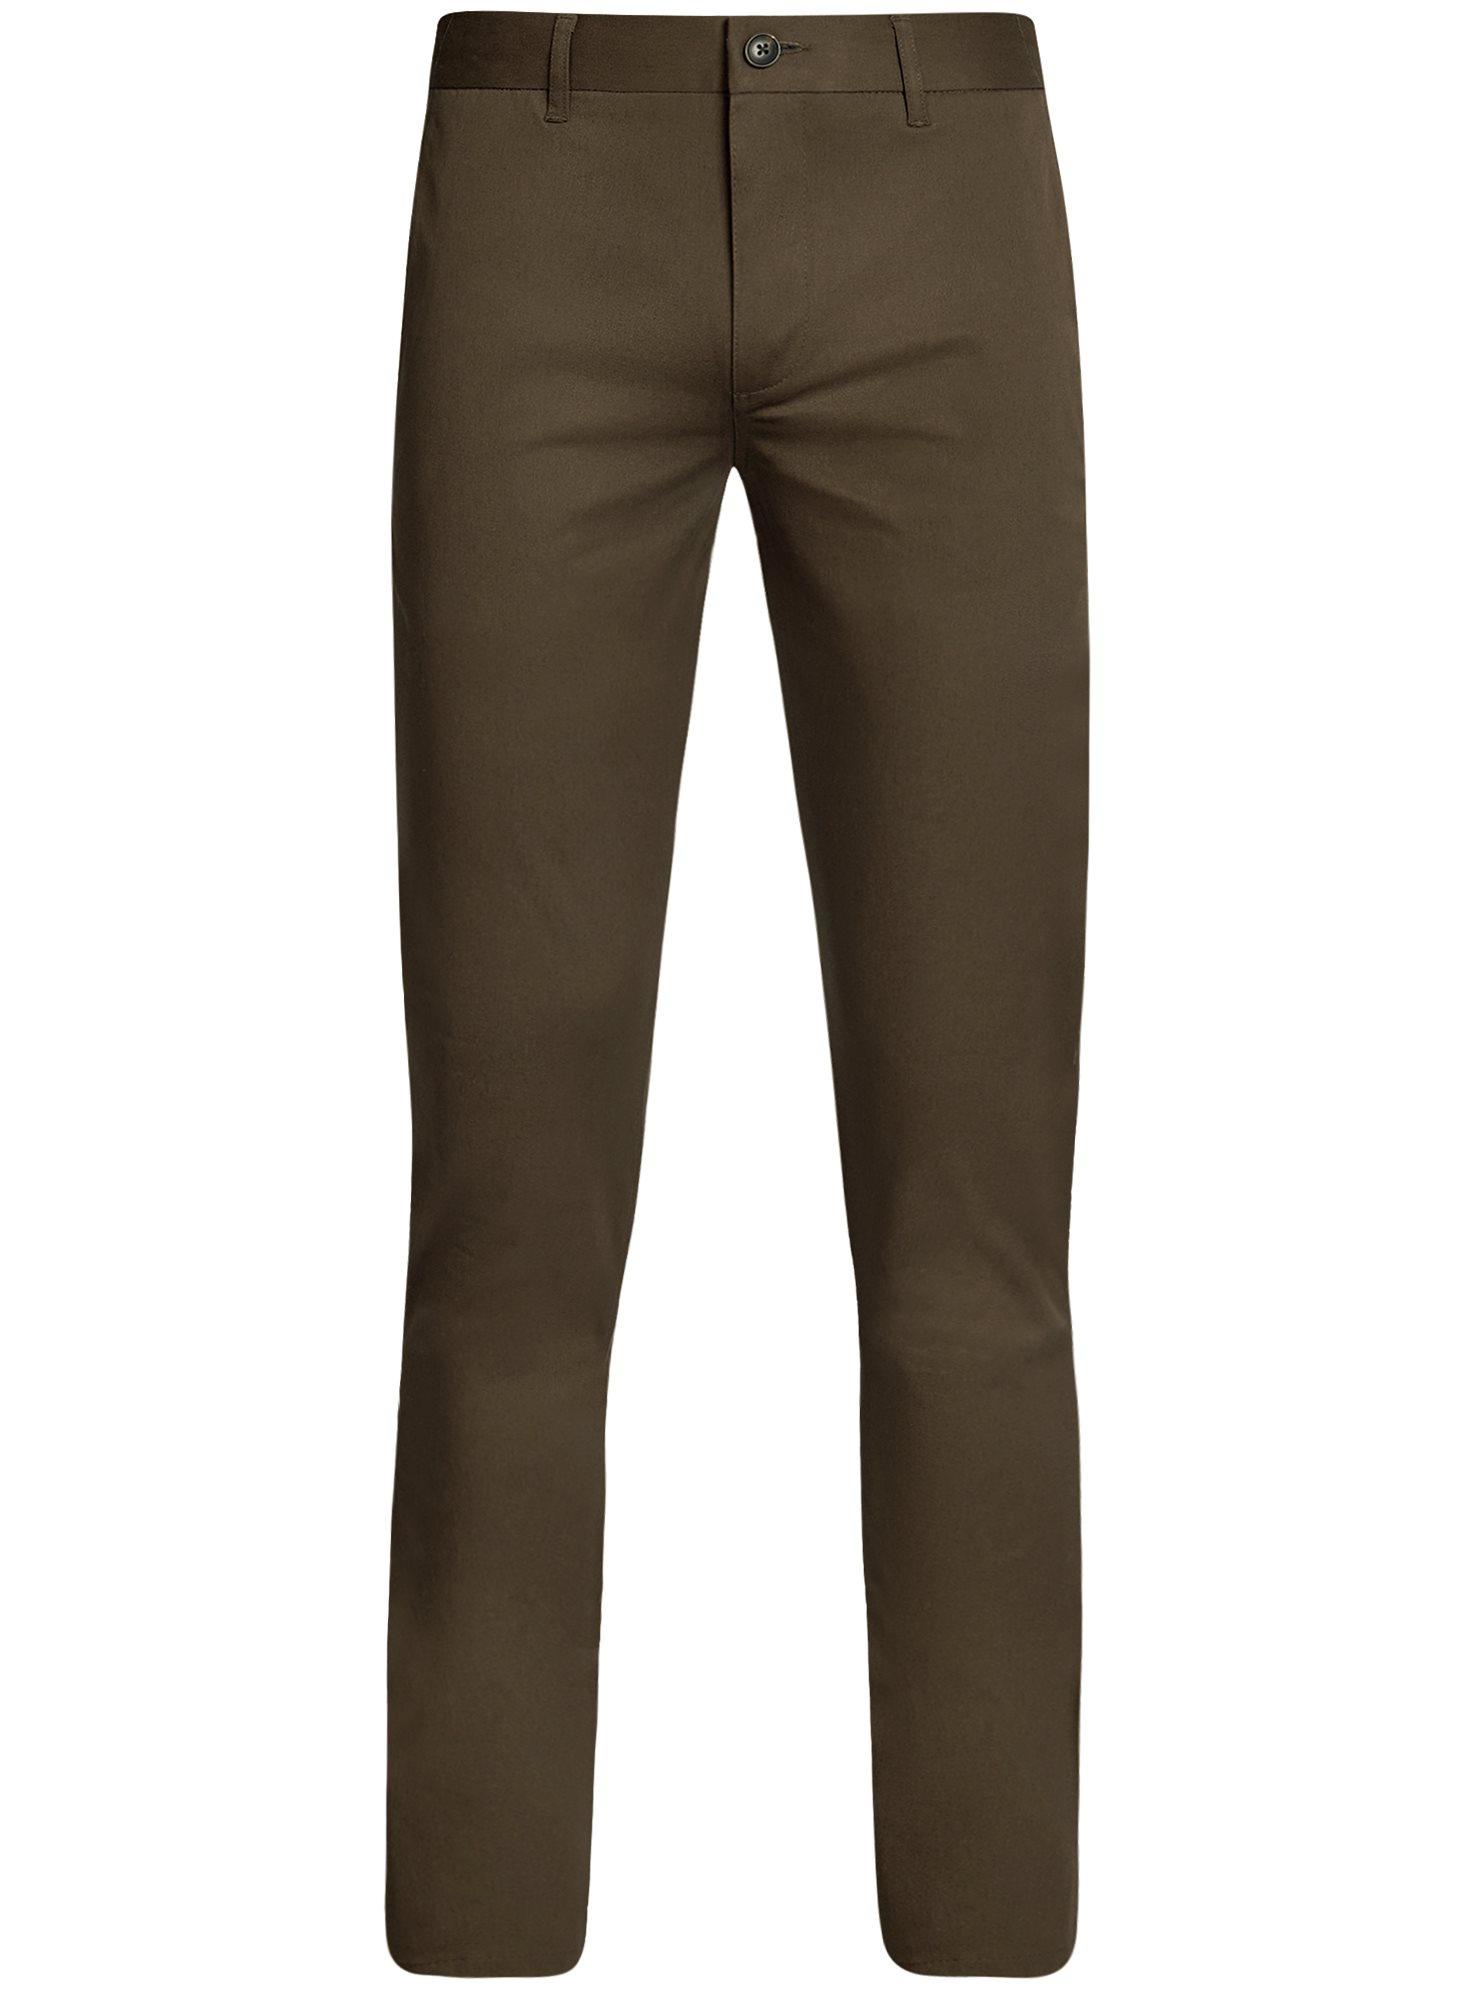 Брюки-чиносы хлопковые oodji для мужчины (коричневый), 2B200015M/21822N/3700N